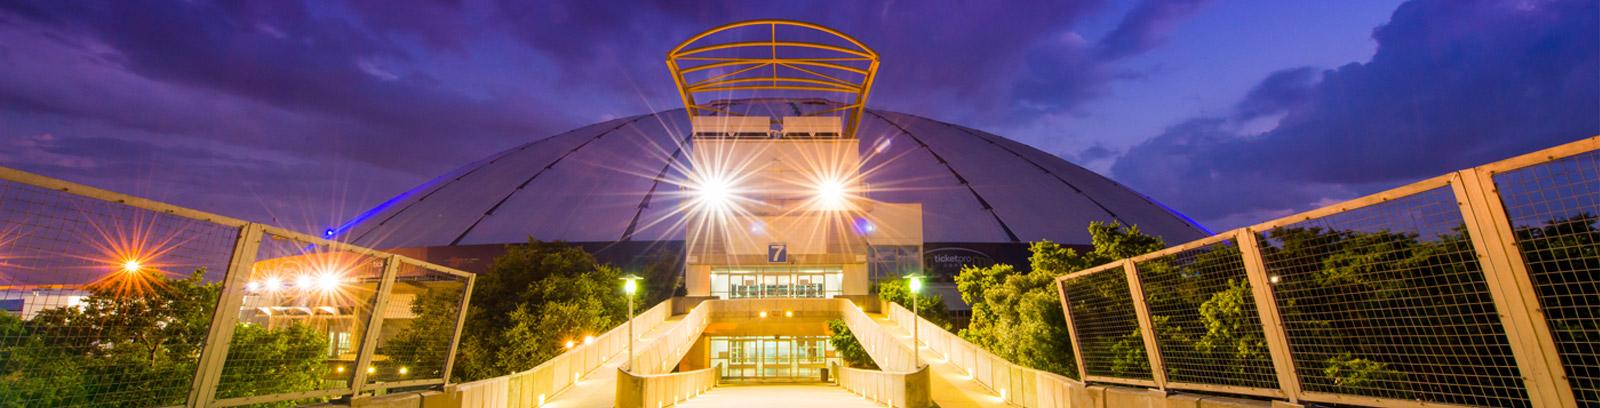 TicketPro Dome Venue pic - Deck & Flooring Expo 2020